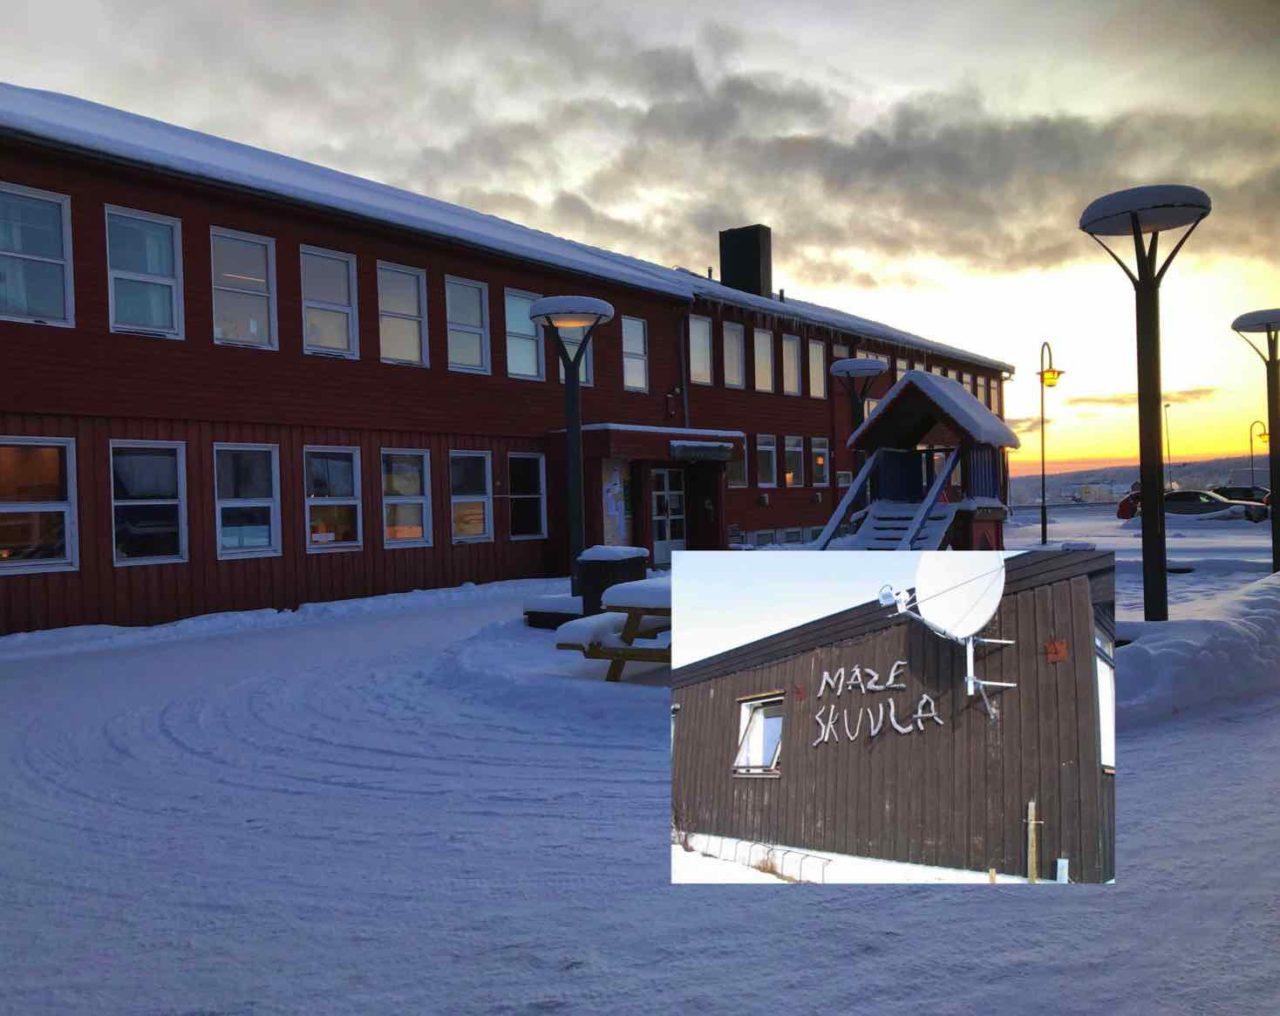 kommunehus_skole-maze-web-1280x1016.jpg